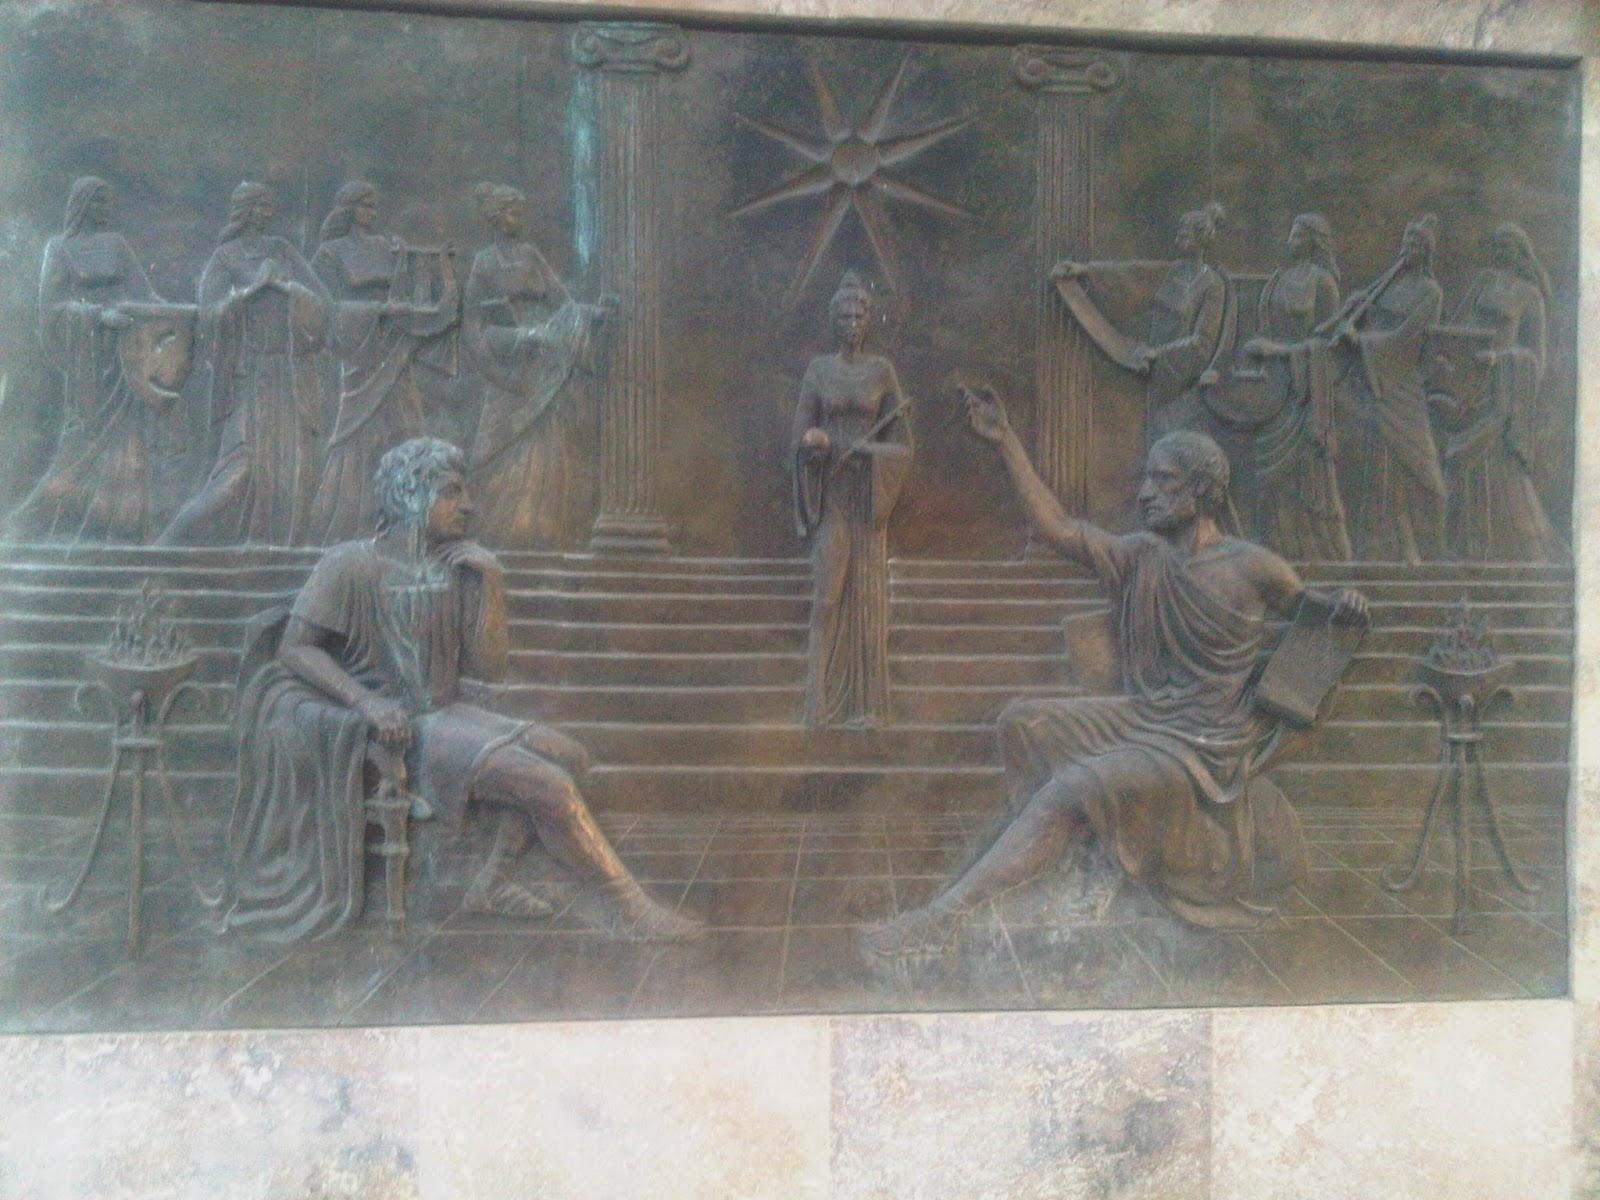 Skopje 20120814 03014 Οι Σκοπιανοί έχουν ανεγείρει μνημείο με τον Αριστοτέλη να διδάσκει τον Μ. Αλέξανδρο... Σλαβικά!!!